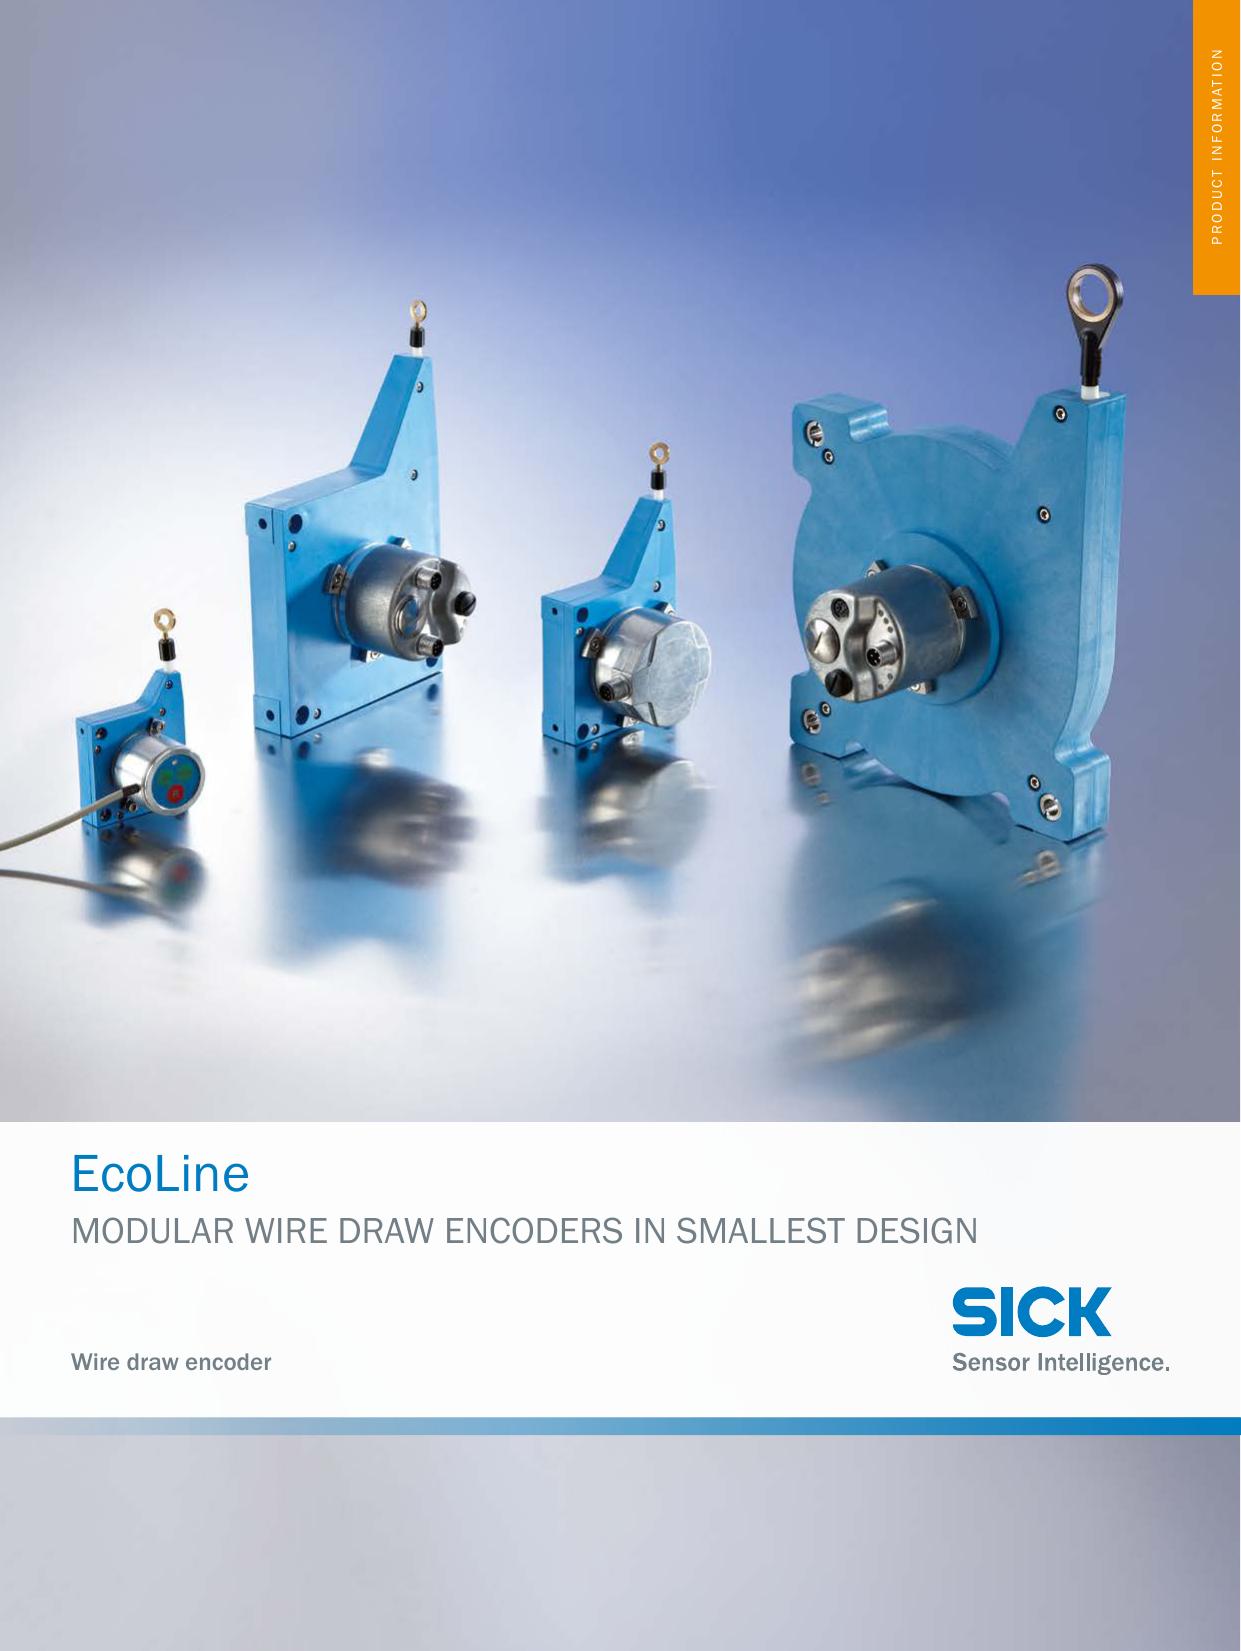 Ecoline Modular Wire Draw Encoders in smallest Design   manualzz.com